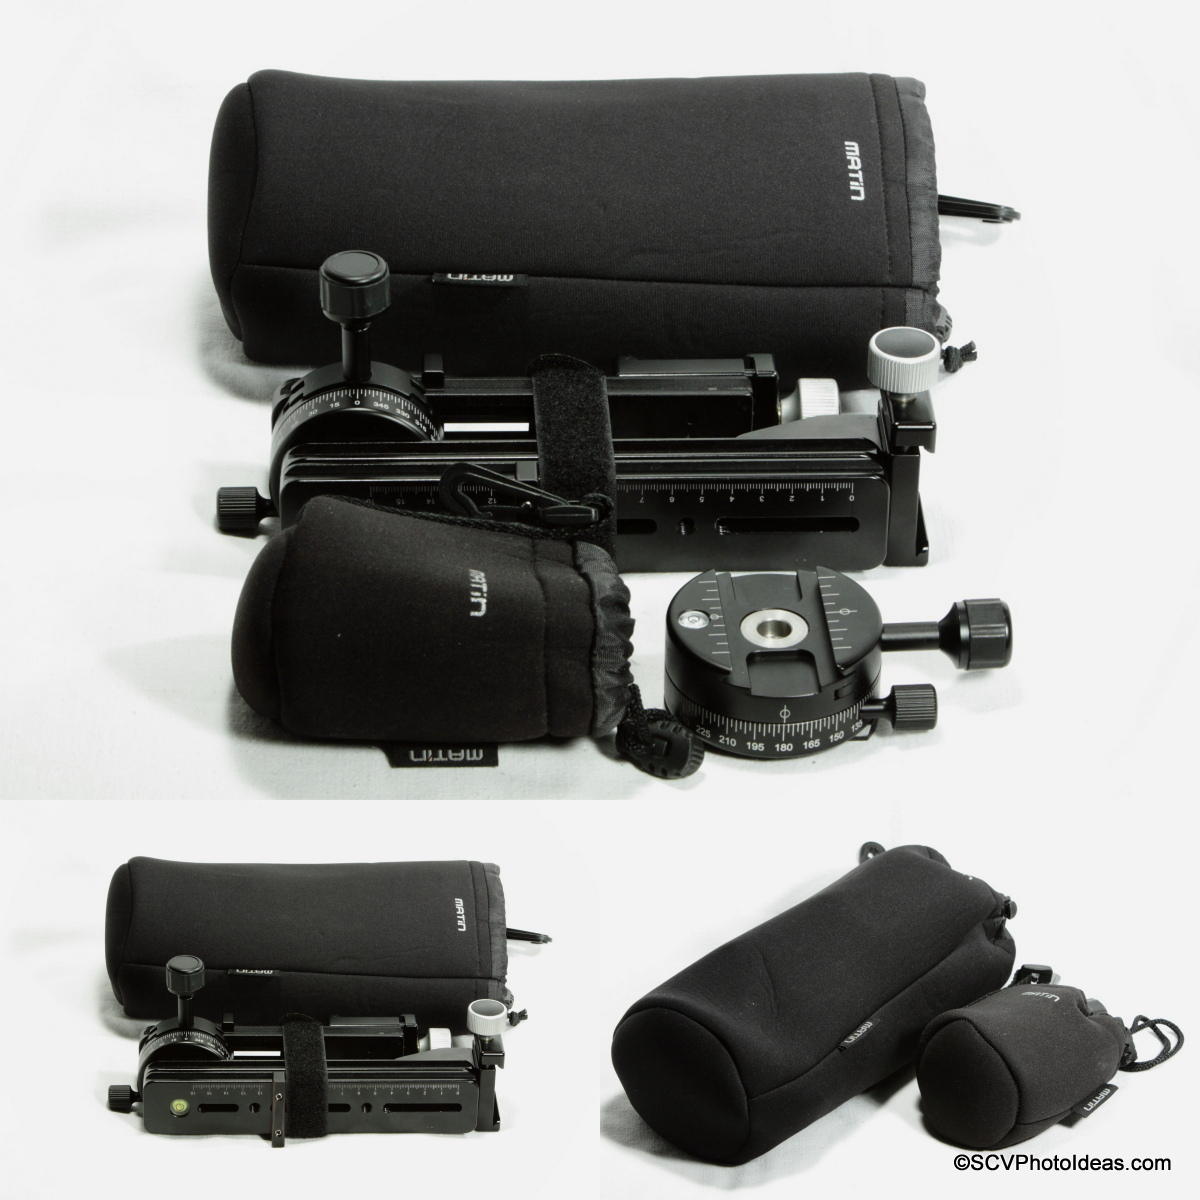 SCV Multirow head packed in Matin Neoprene Lens Pouches XL & M